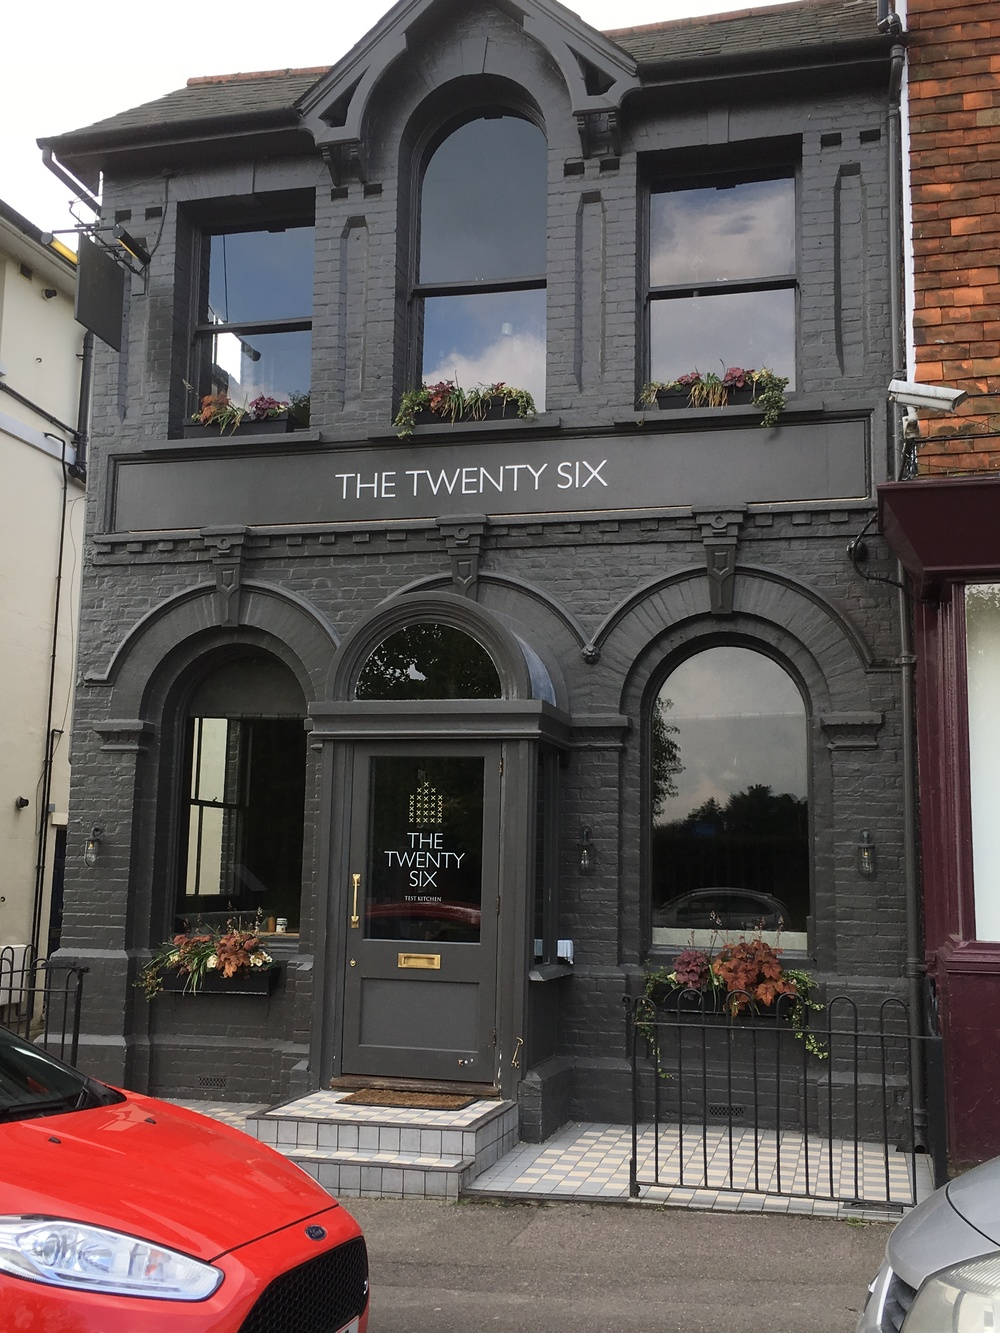 The Twenty Six in Southborough